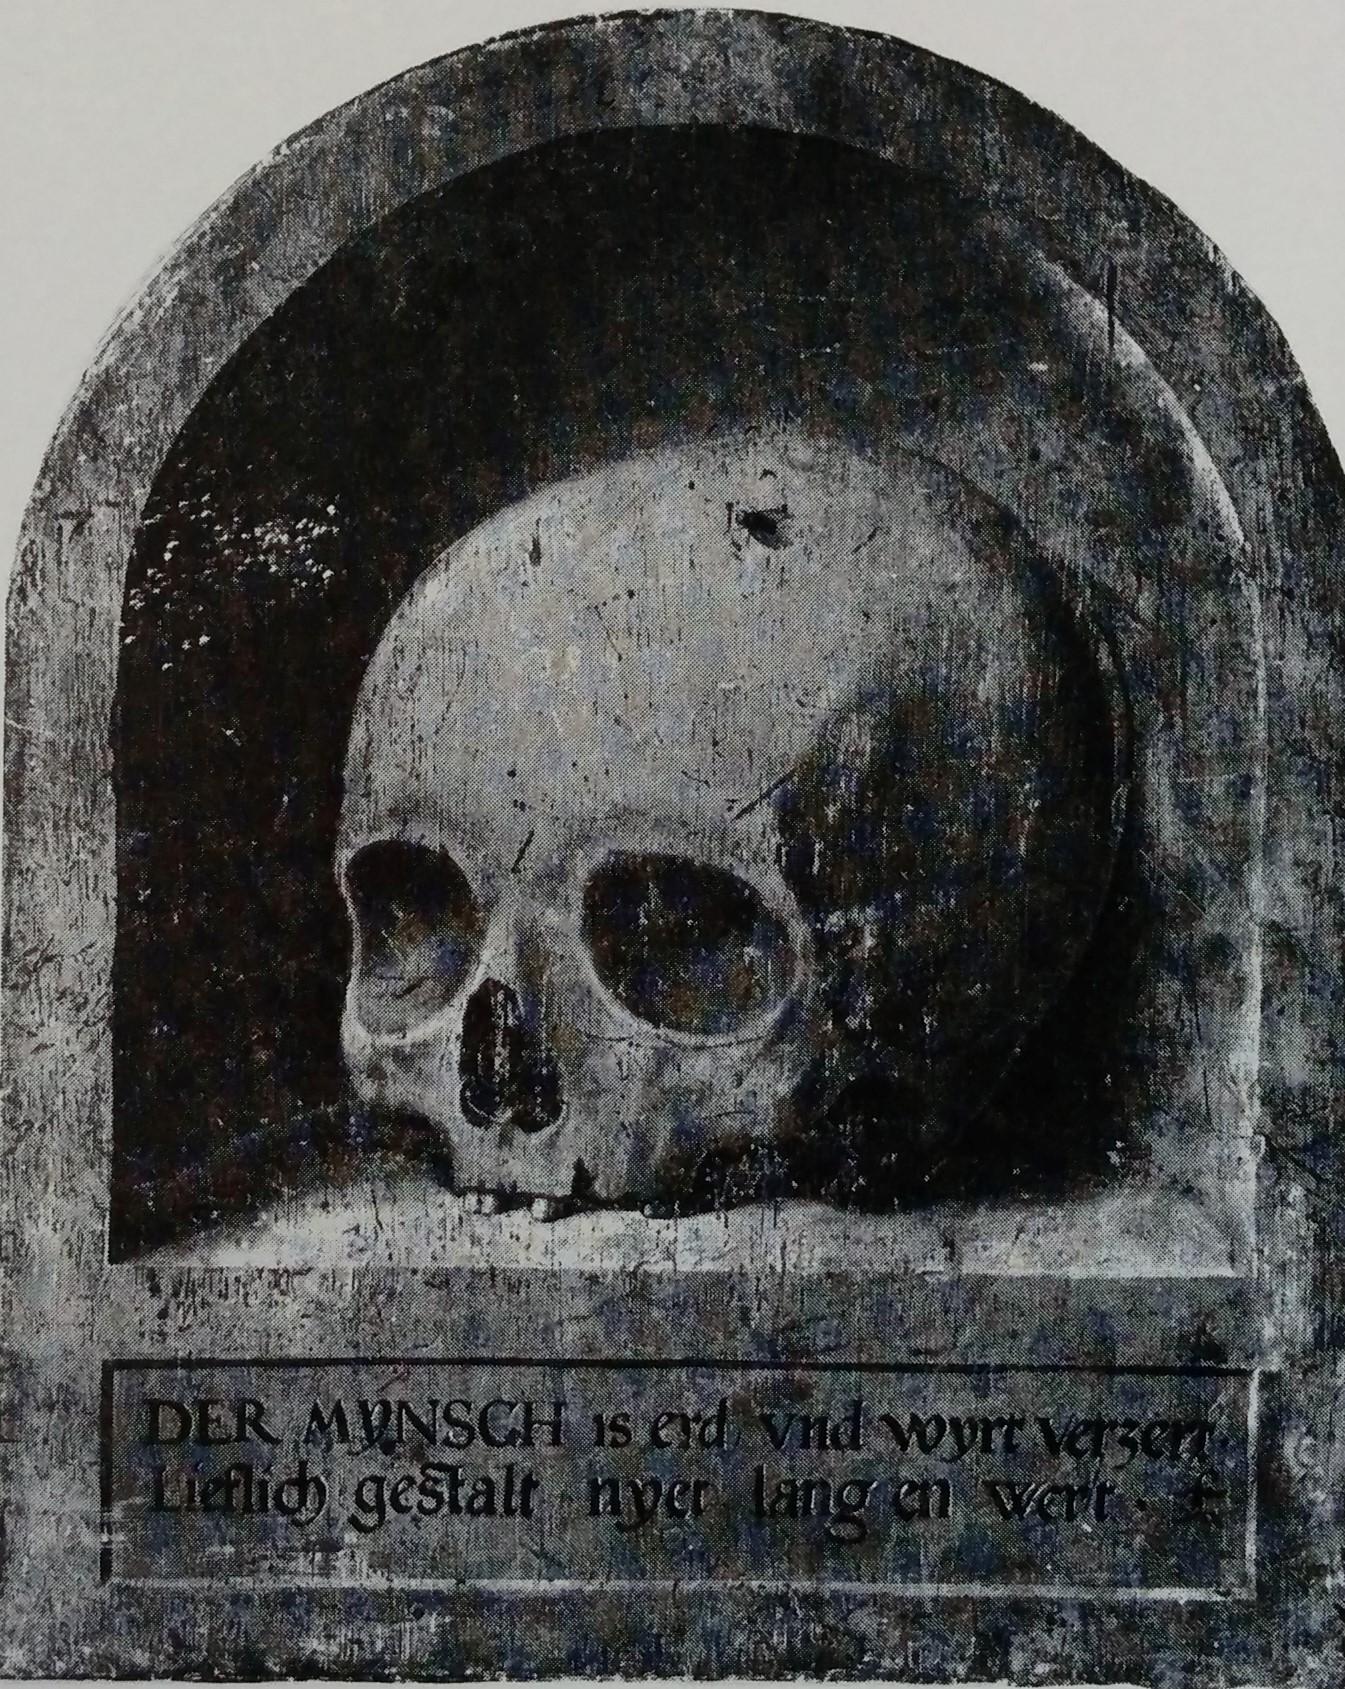 Cercle de Barthel Bruyn l'Ancien 1540-50 revers portrait masculin Jagdschloss Grunewald Berlin